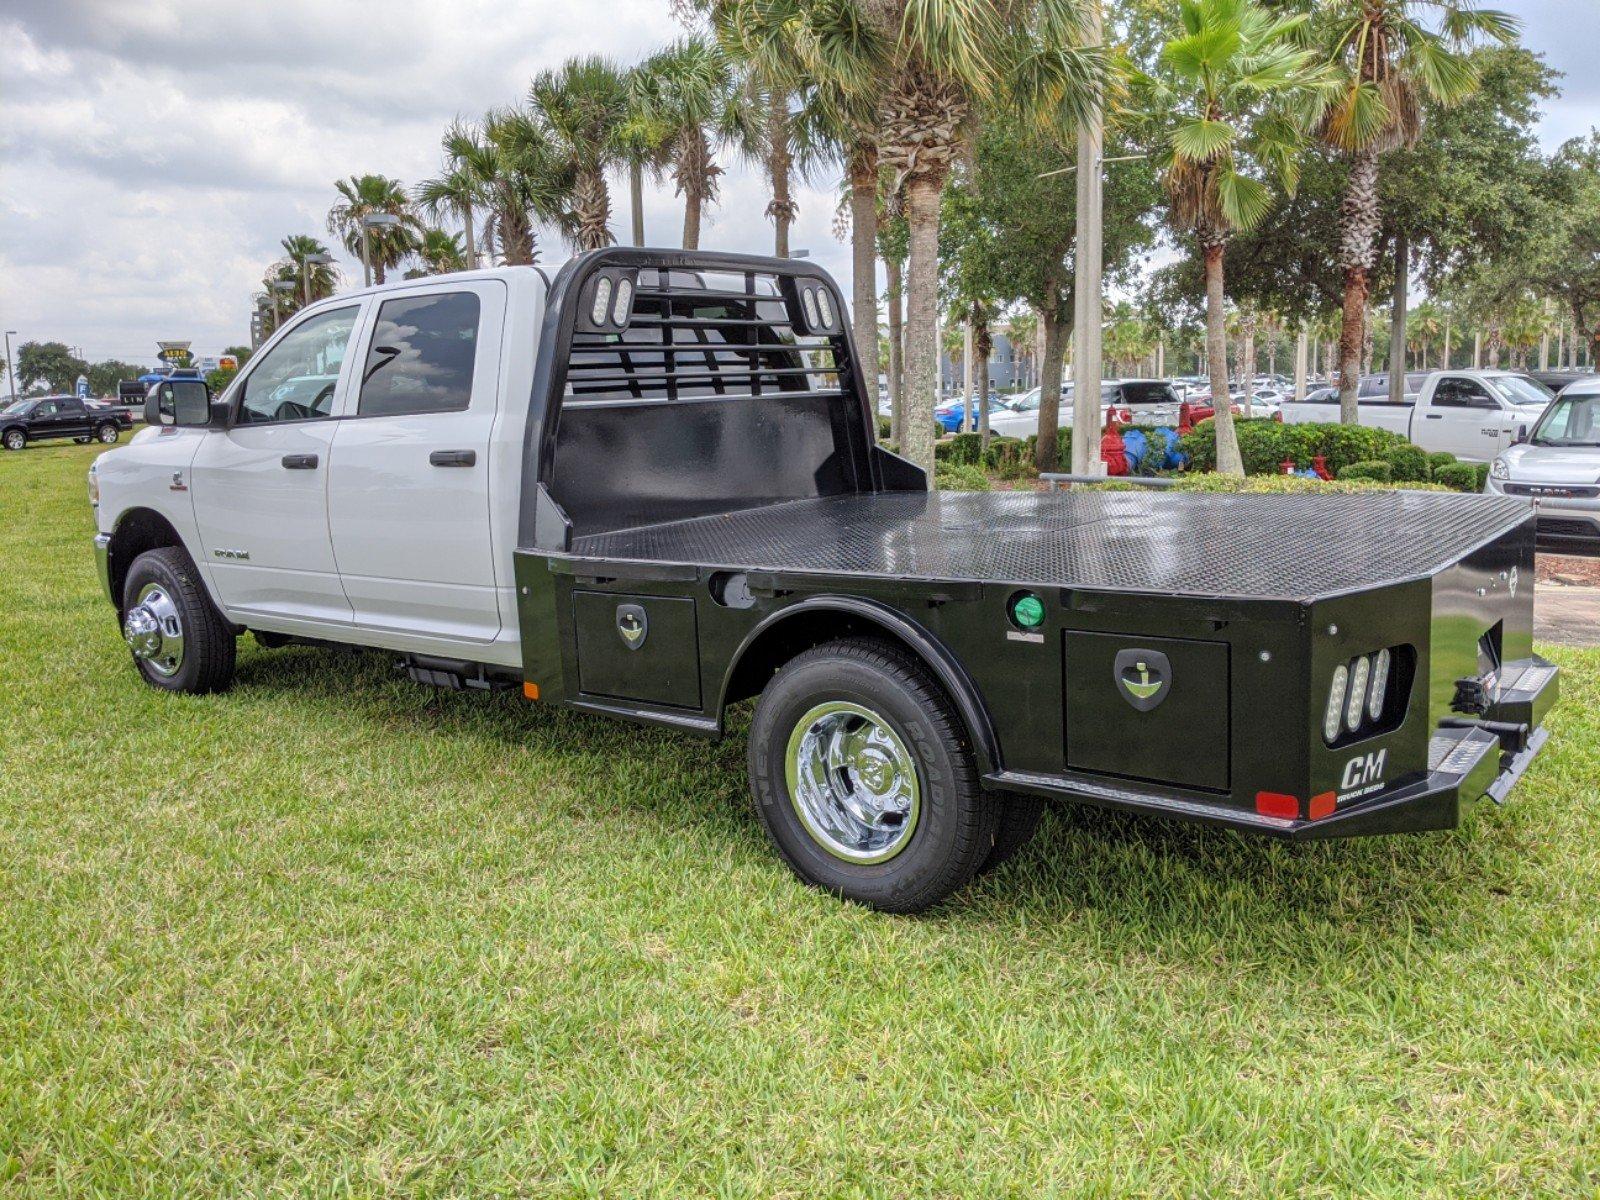 2020 Ram 3500 Crew Cab DRW 4x4, CM Truck Beds Platform Body #R20188 - photo 1